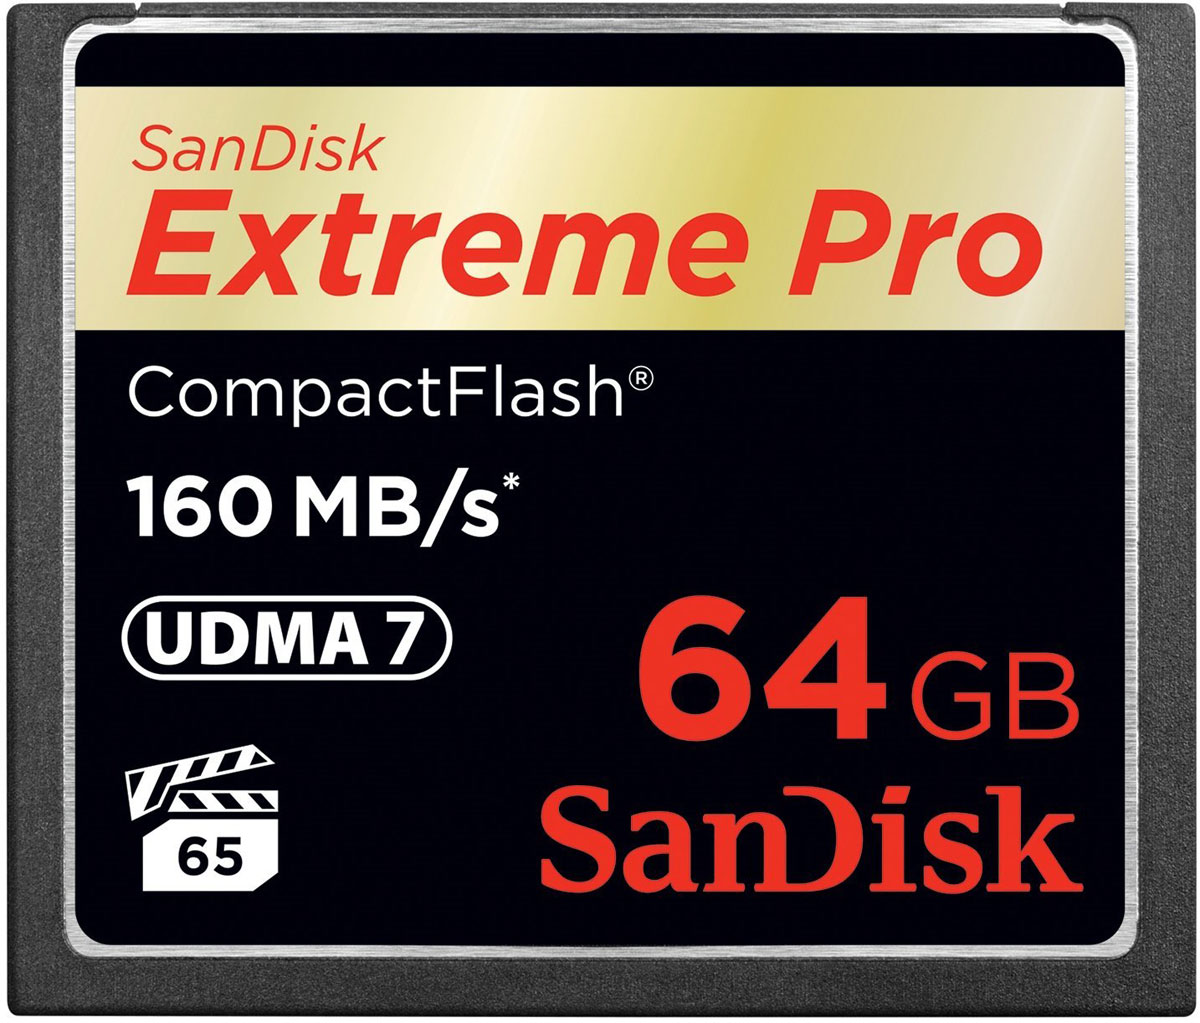 SanDisk Extreme Pro CompactFlash 64GB карта памяти